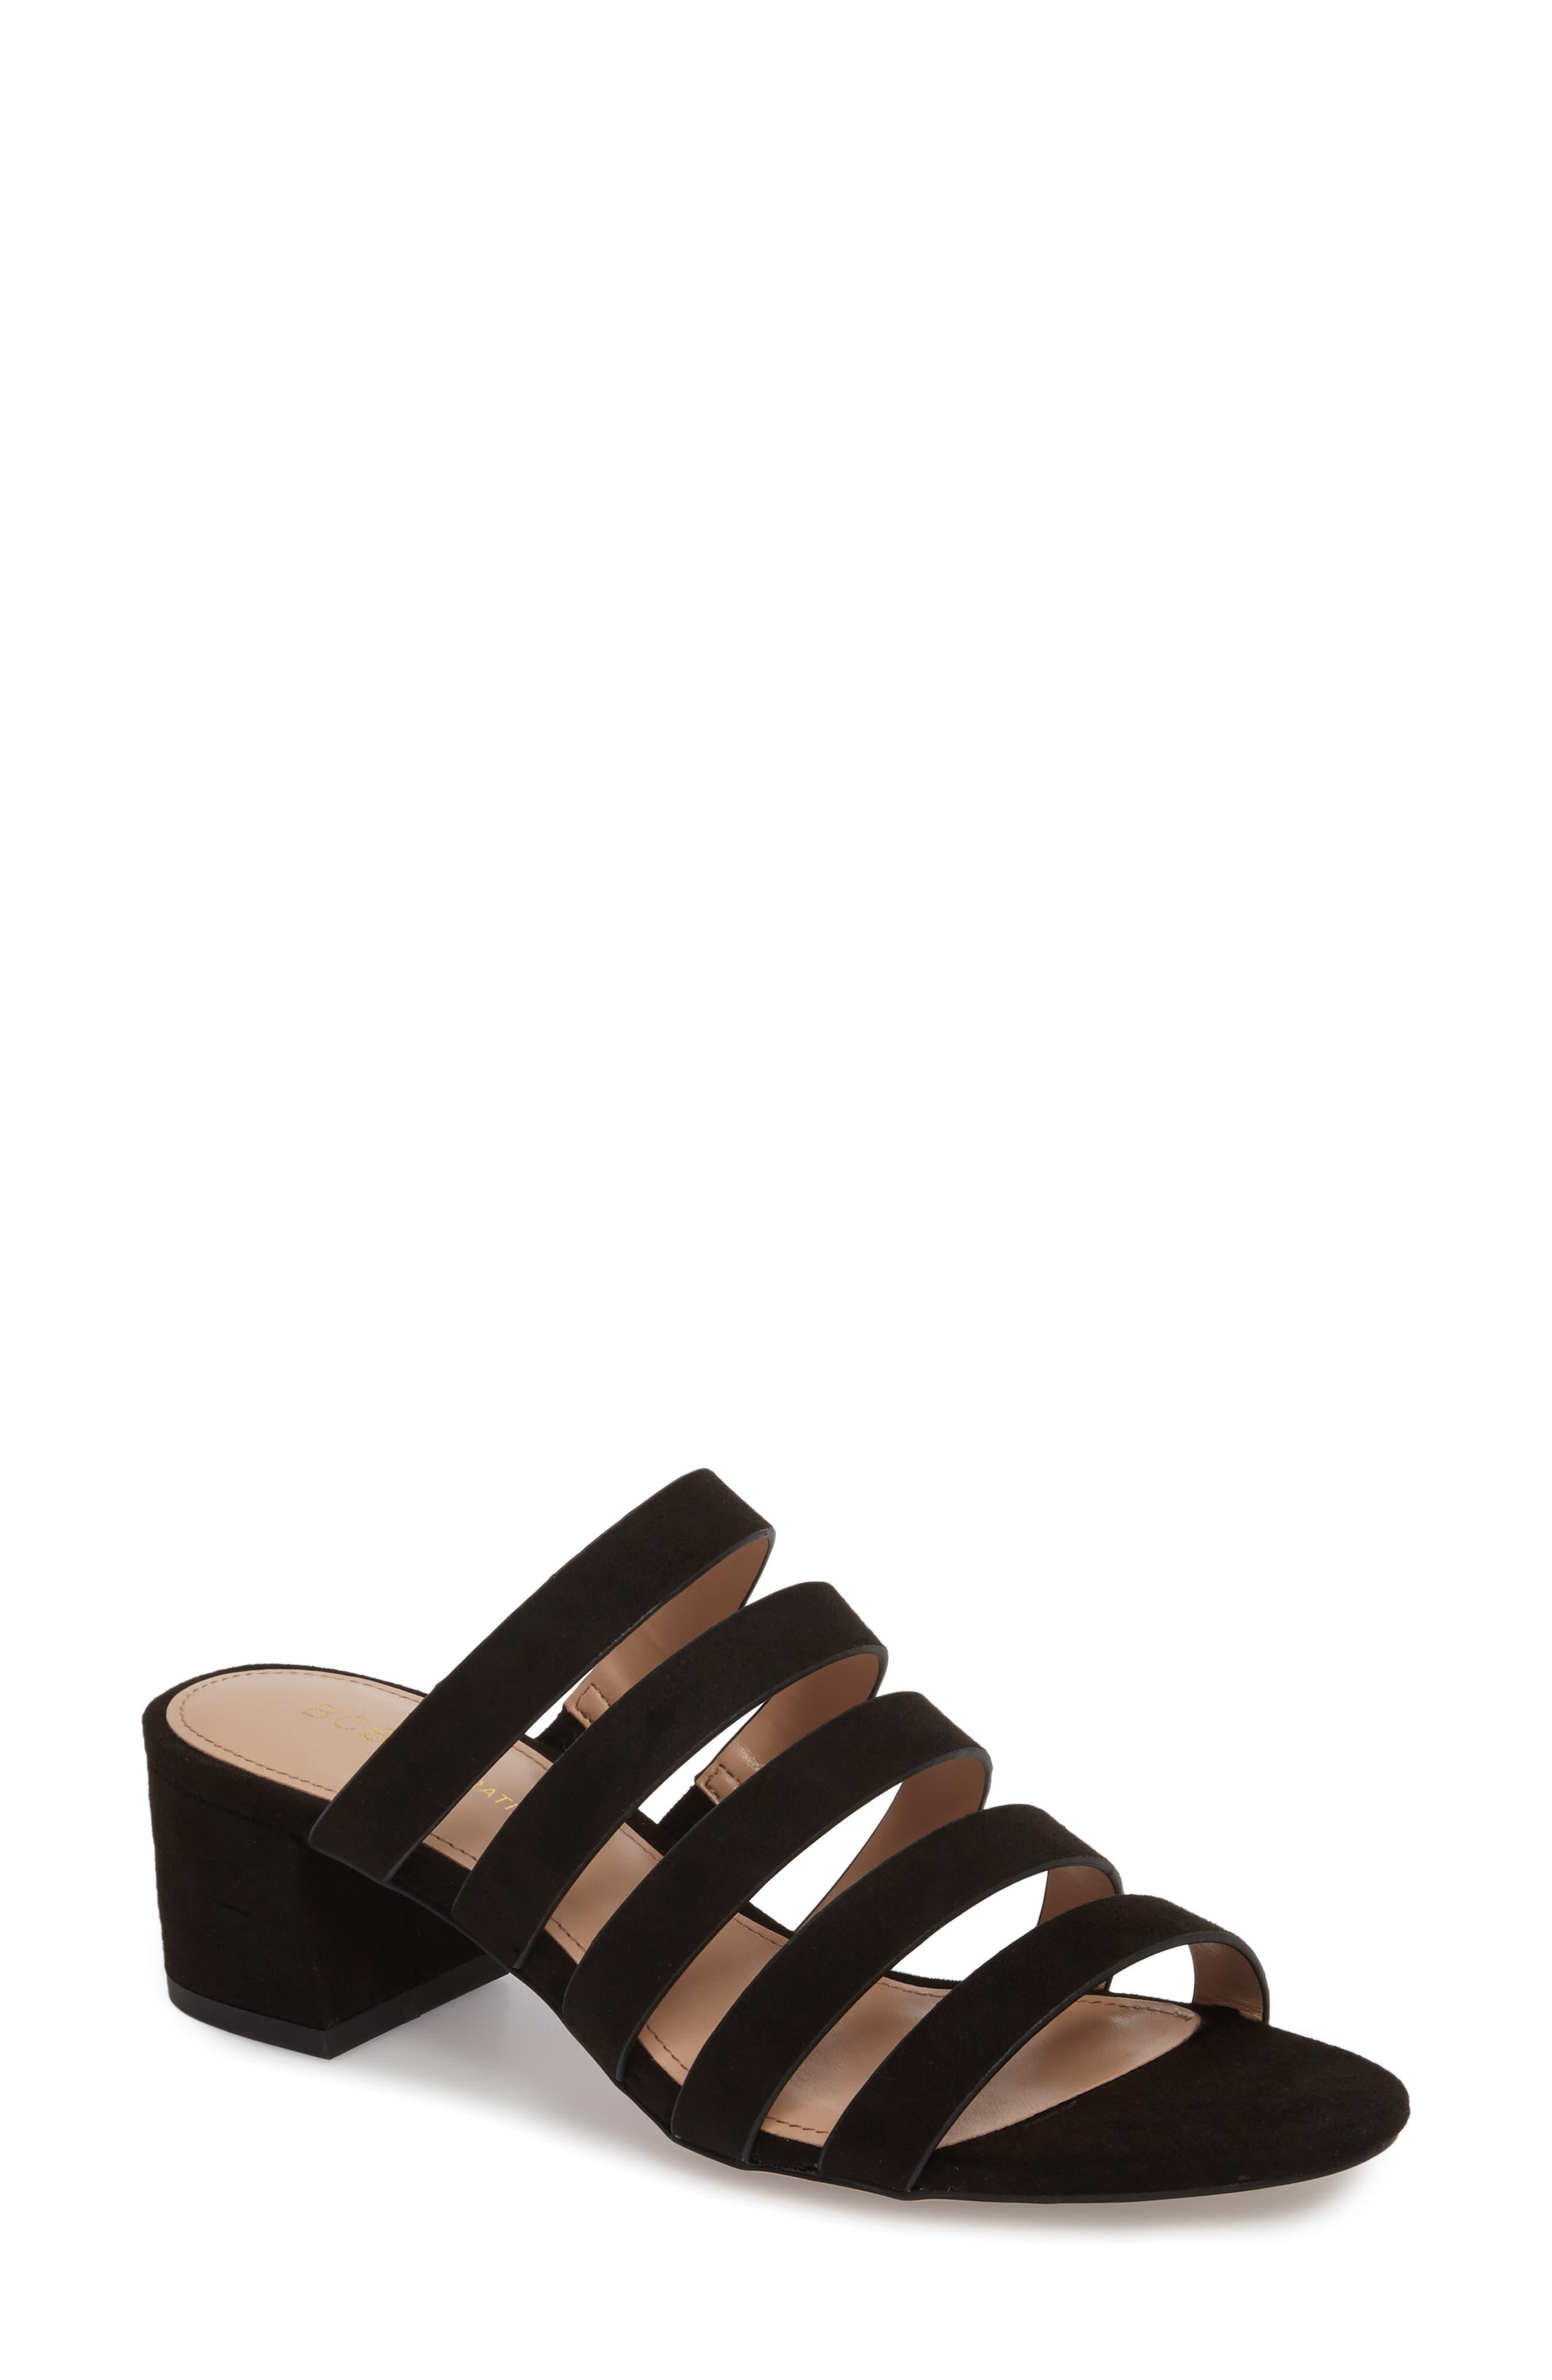 Frankie Slide Sandal,                         Main,                         color, Black Micro Suede